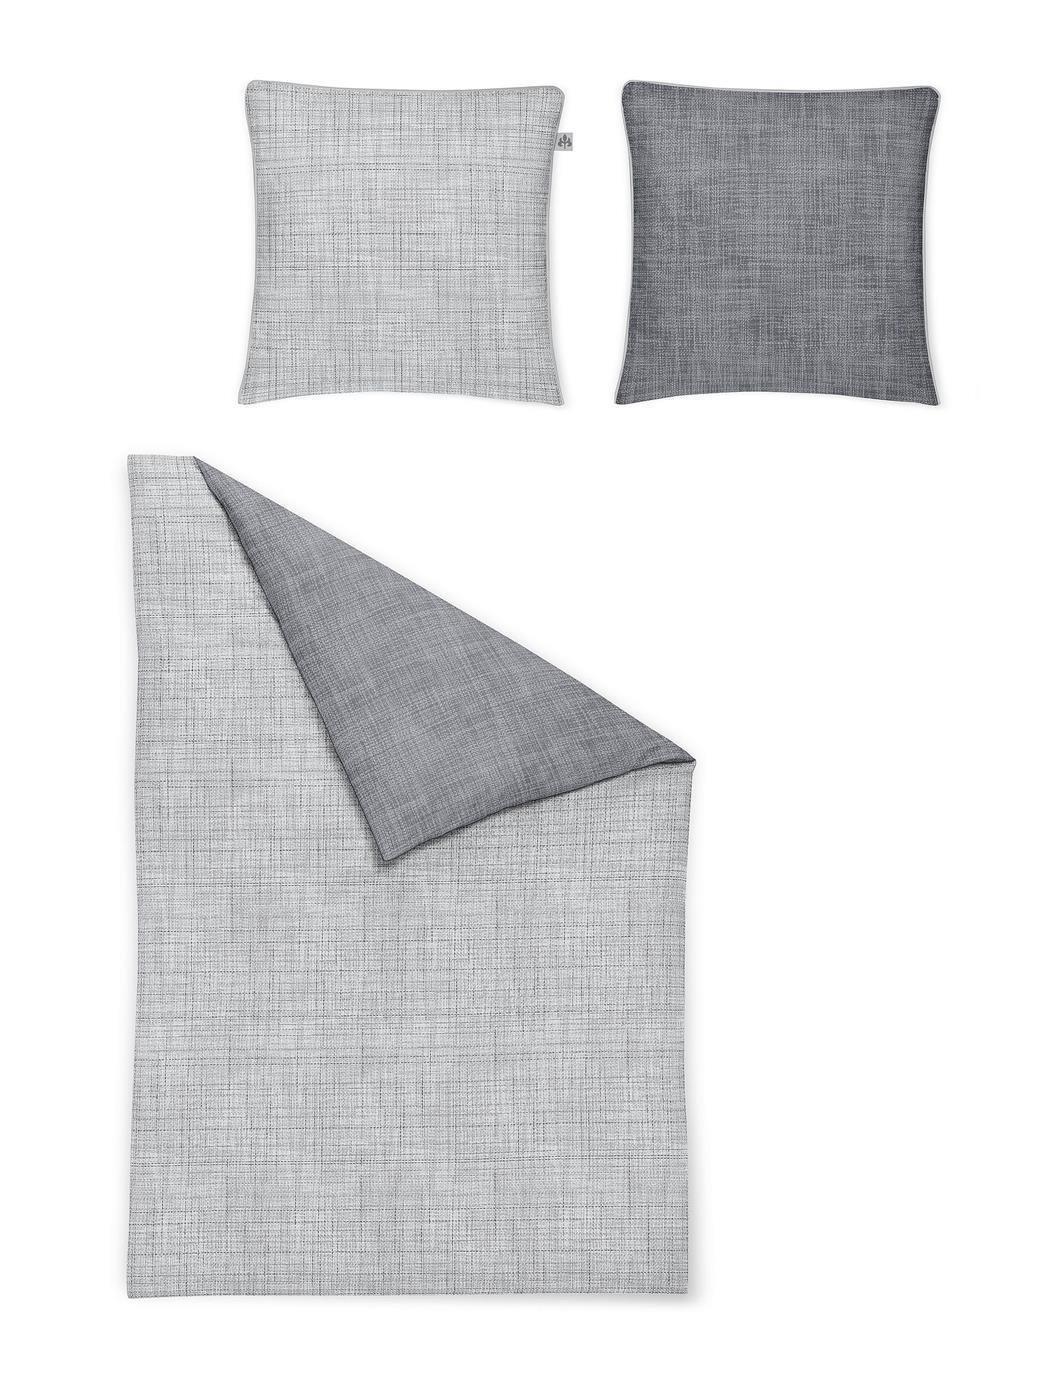 Irisette Mako Satin Bettwäsche 2 teilig Bettbezug 155 x 200 cm Kopfkissenbezug 80 x 80 cm Sol-K 314077-20 Denim